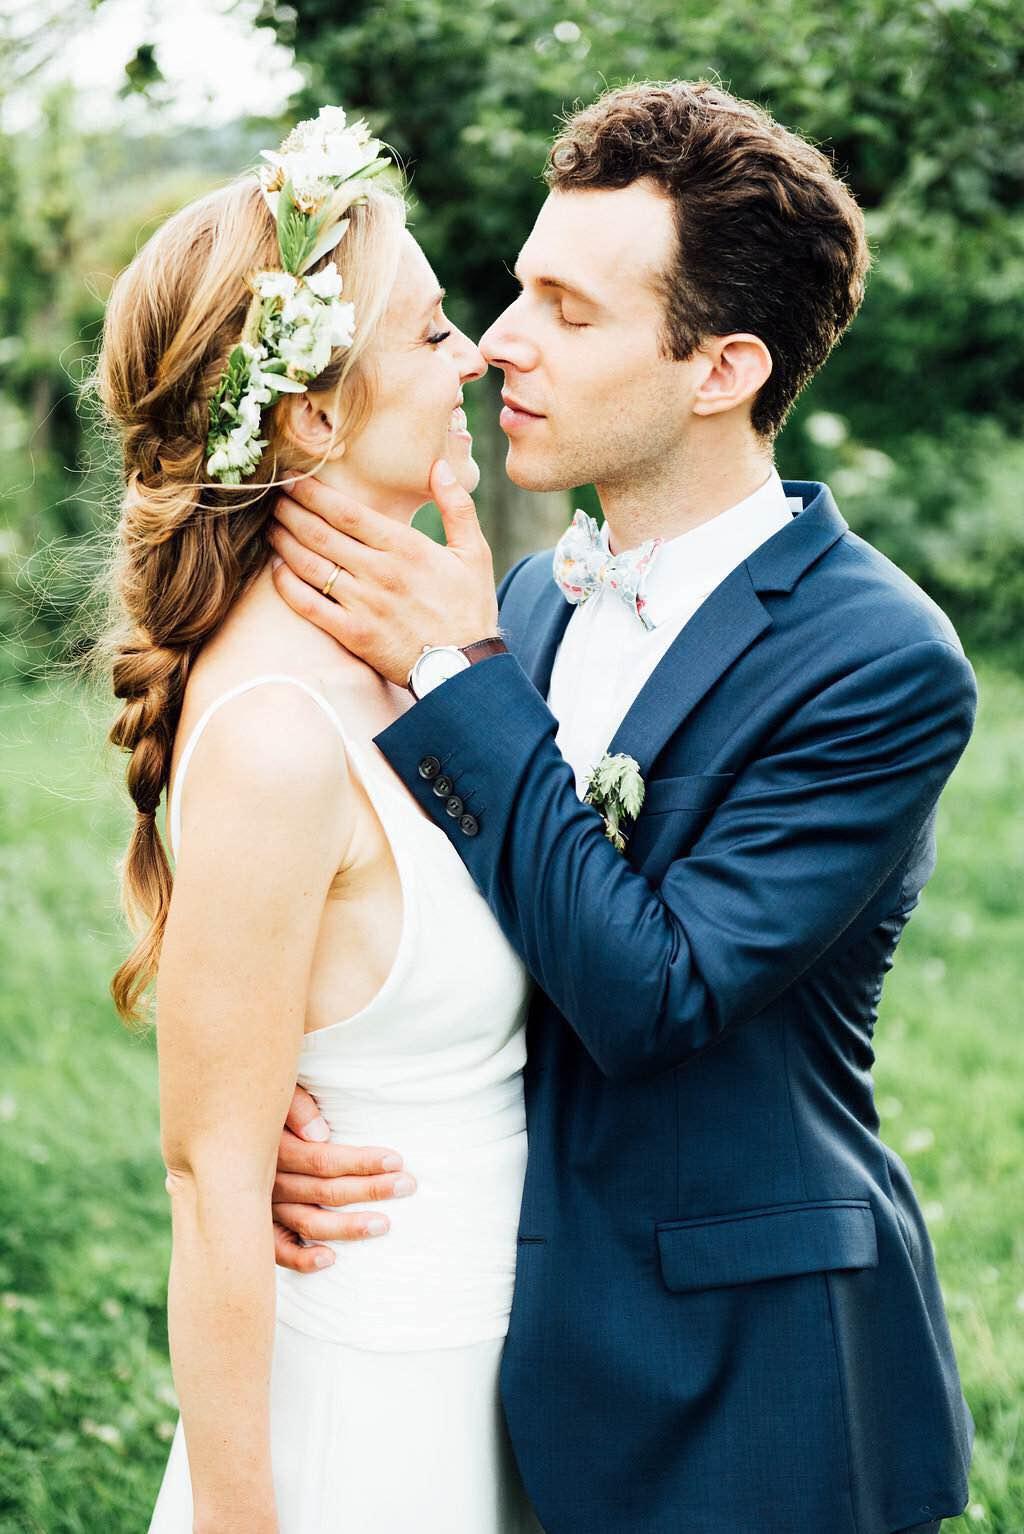 Le mariage d'Eryn